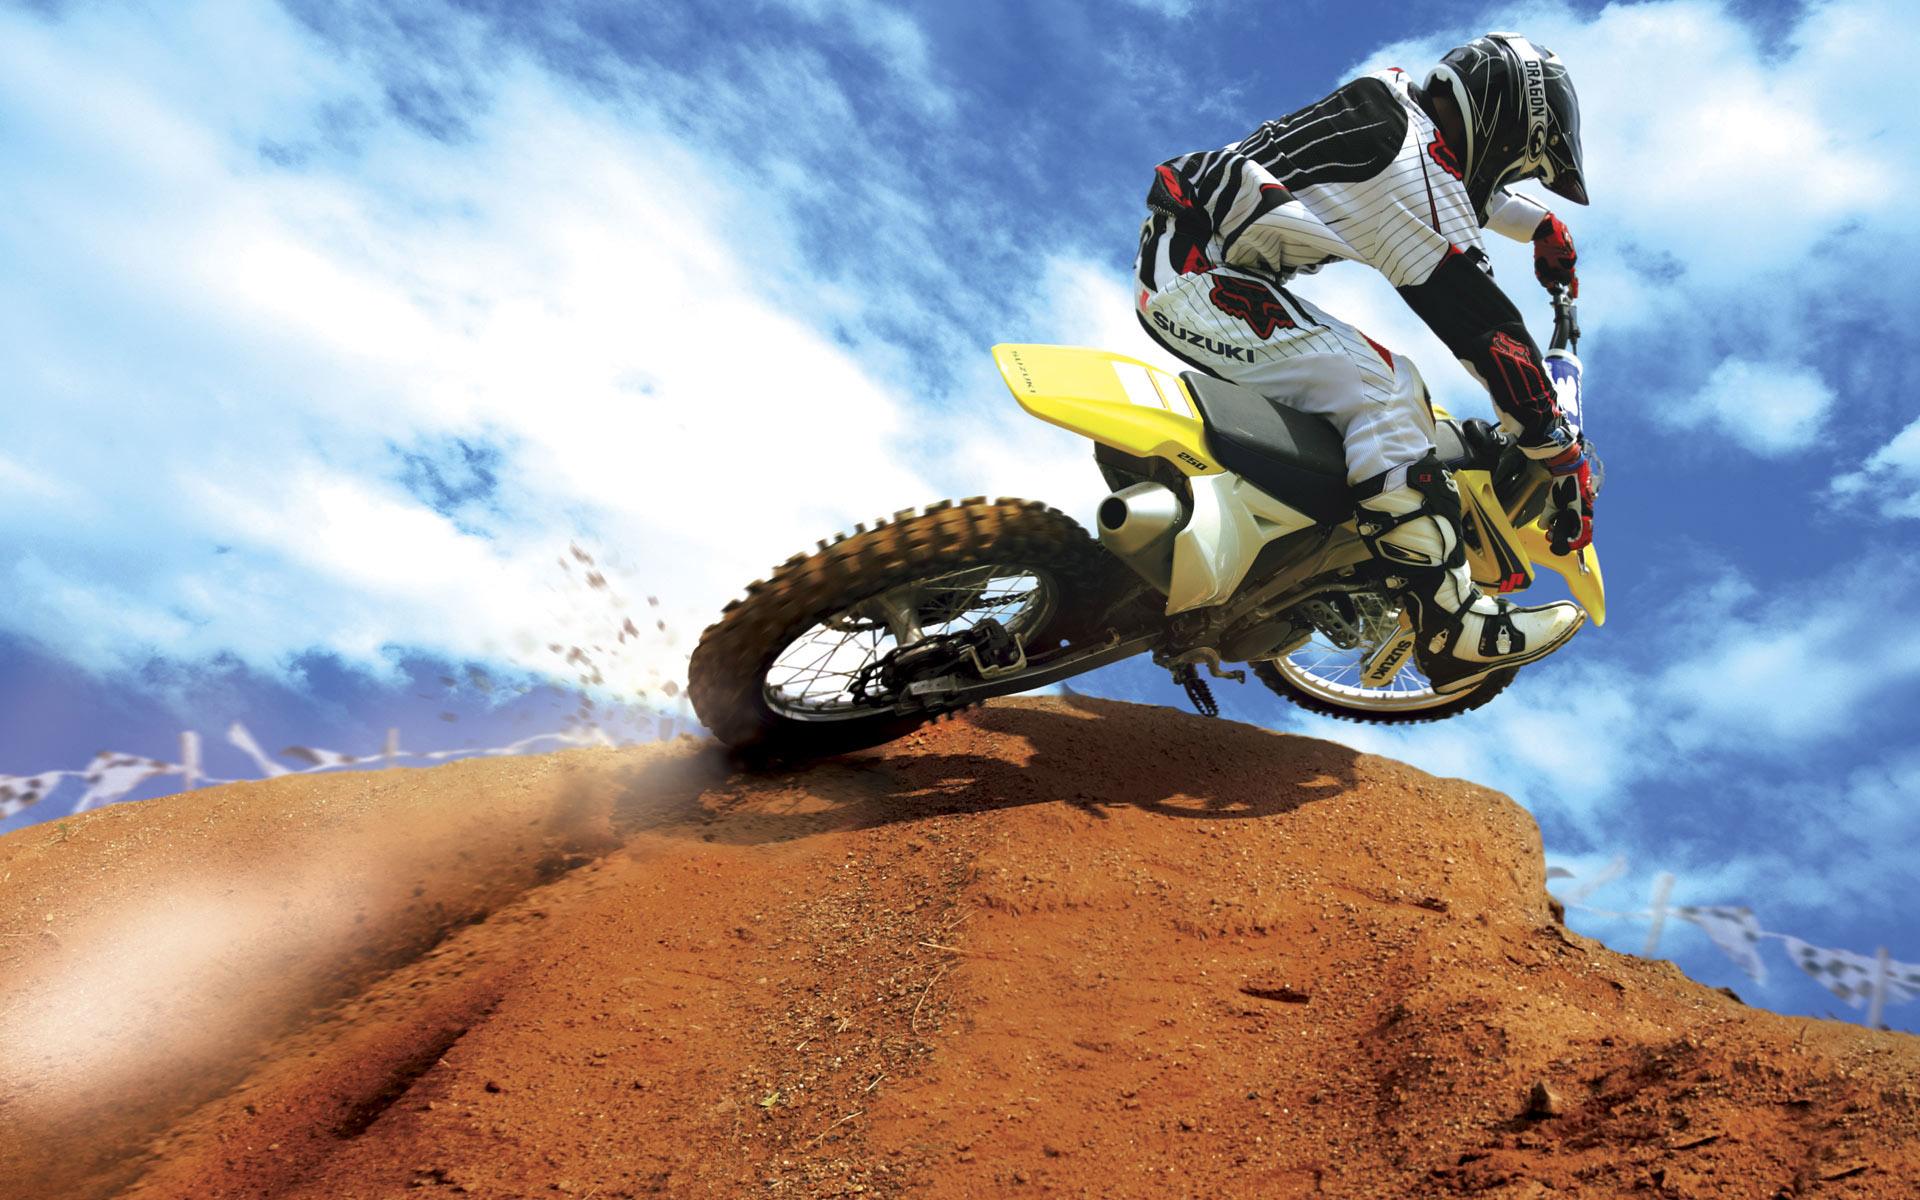 Crazy Motocross Bike Wallpapers HD Wallpapers 1920x1200